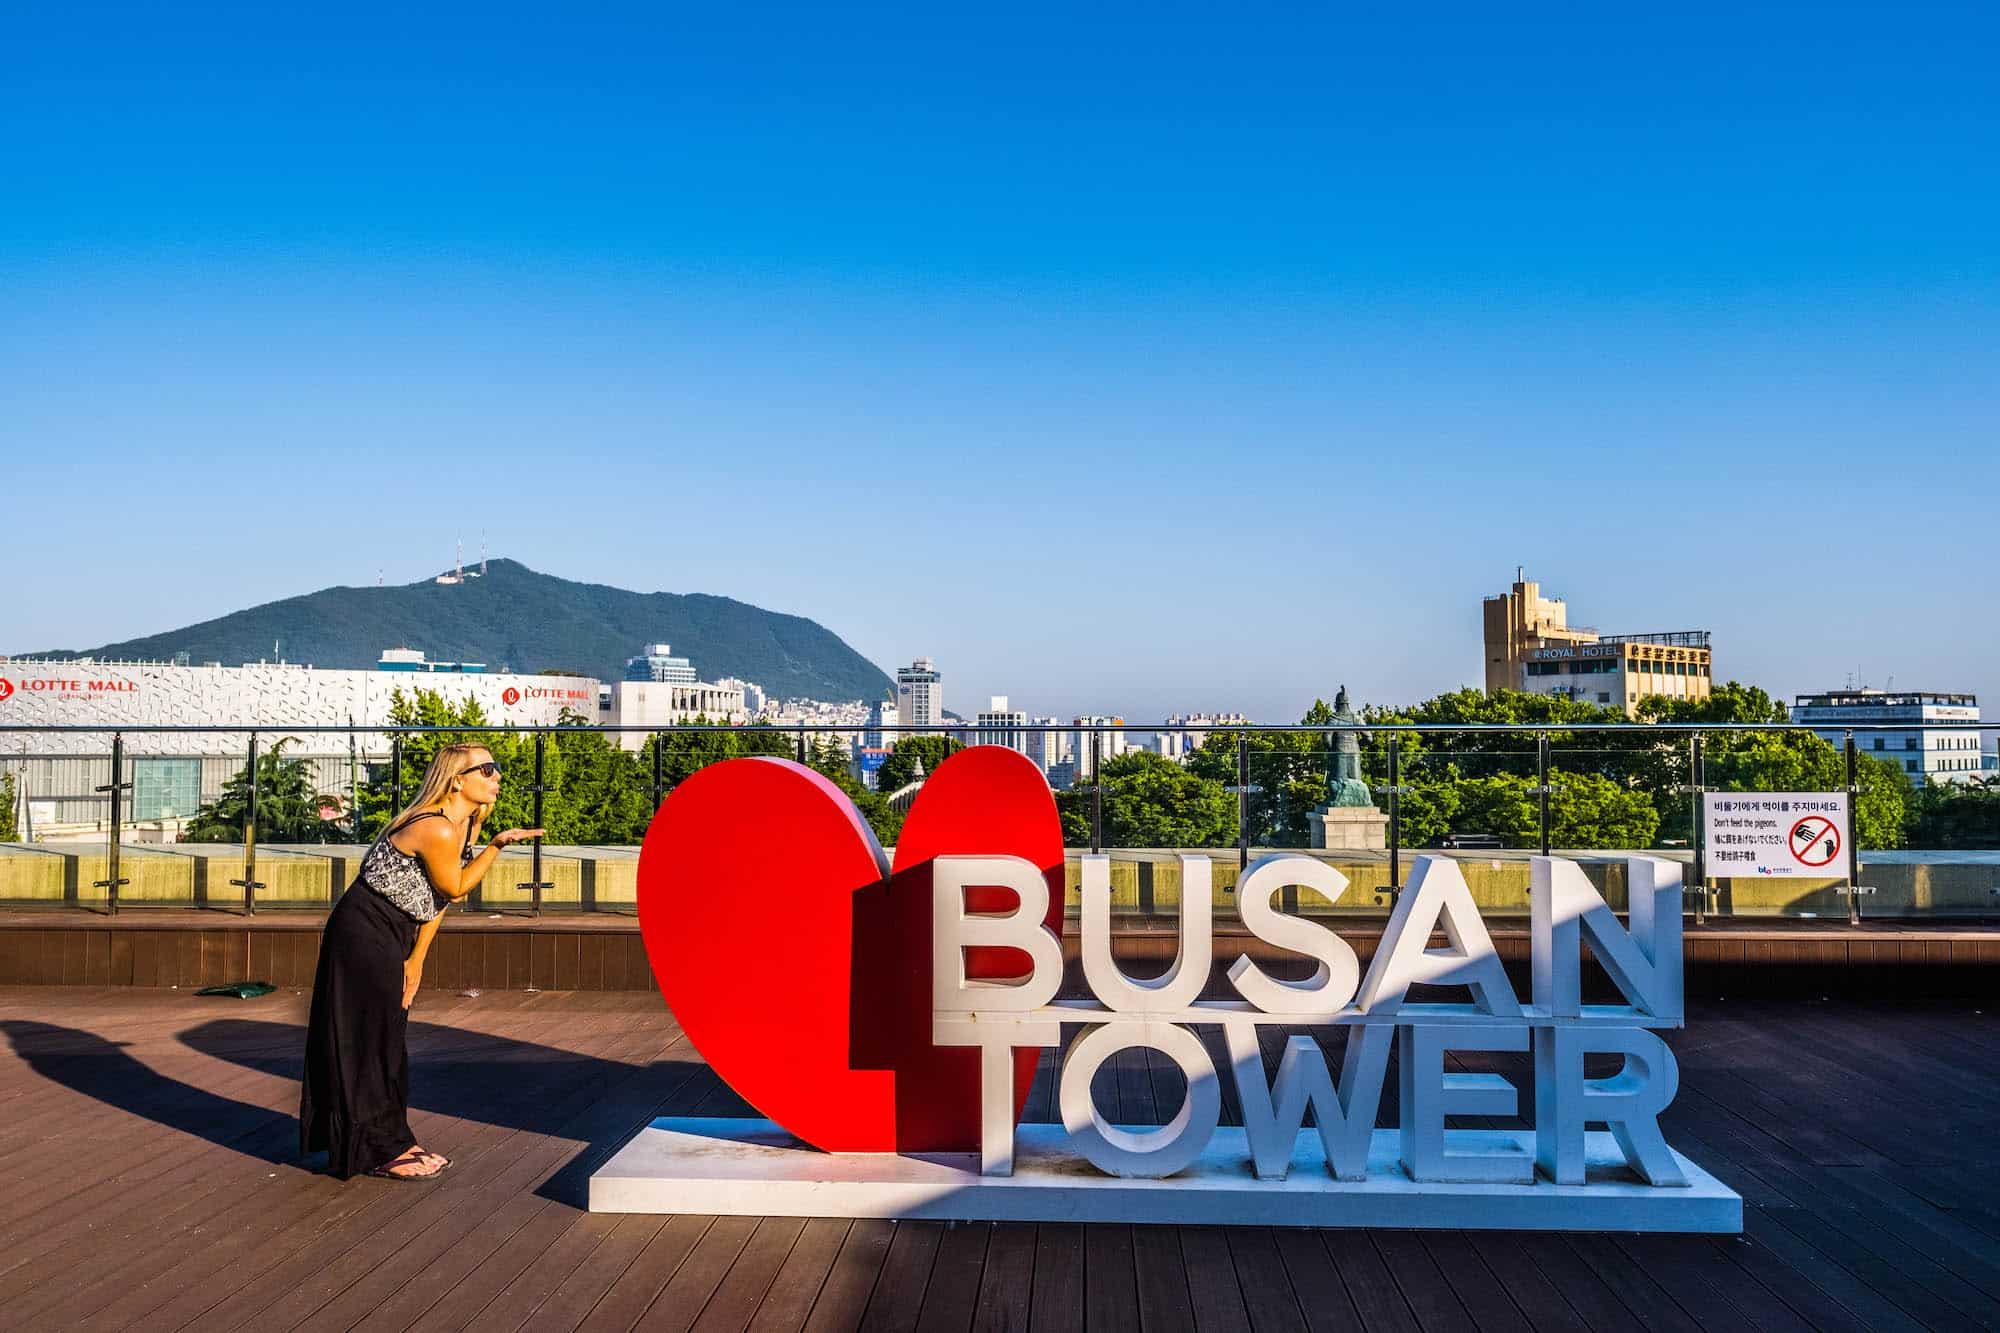 Things to do in Busan - Busan Tower